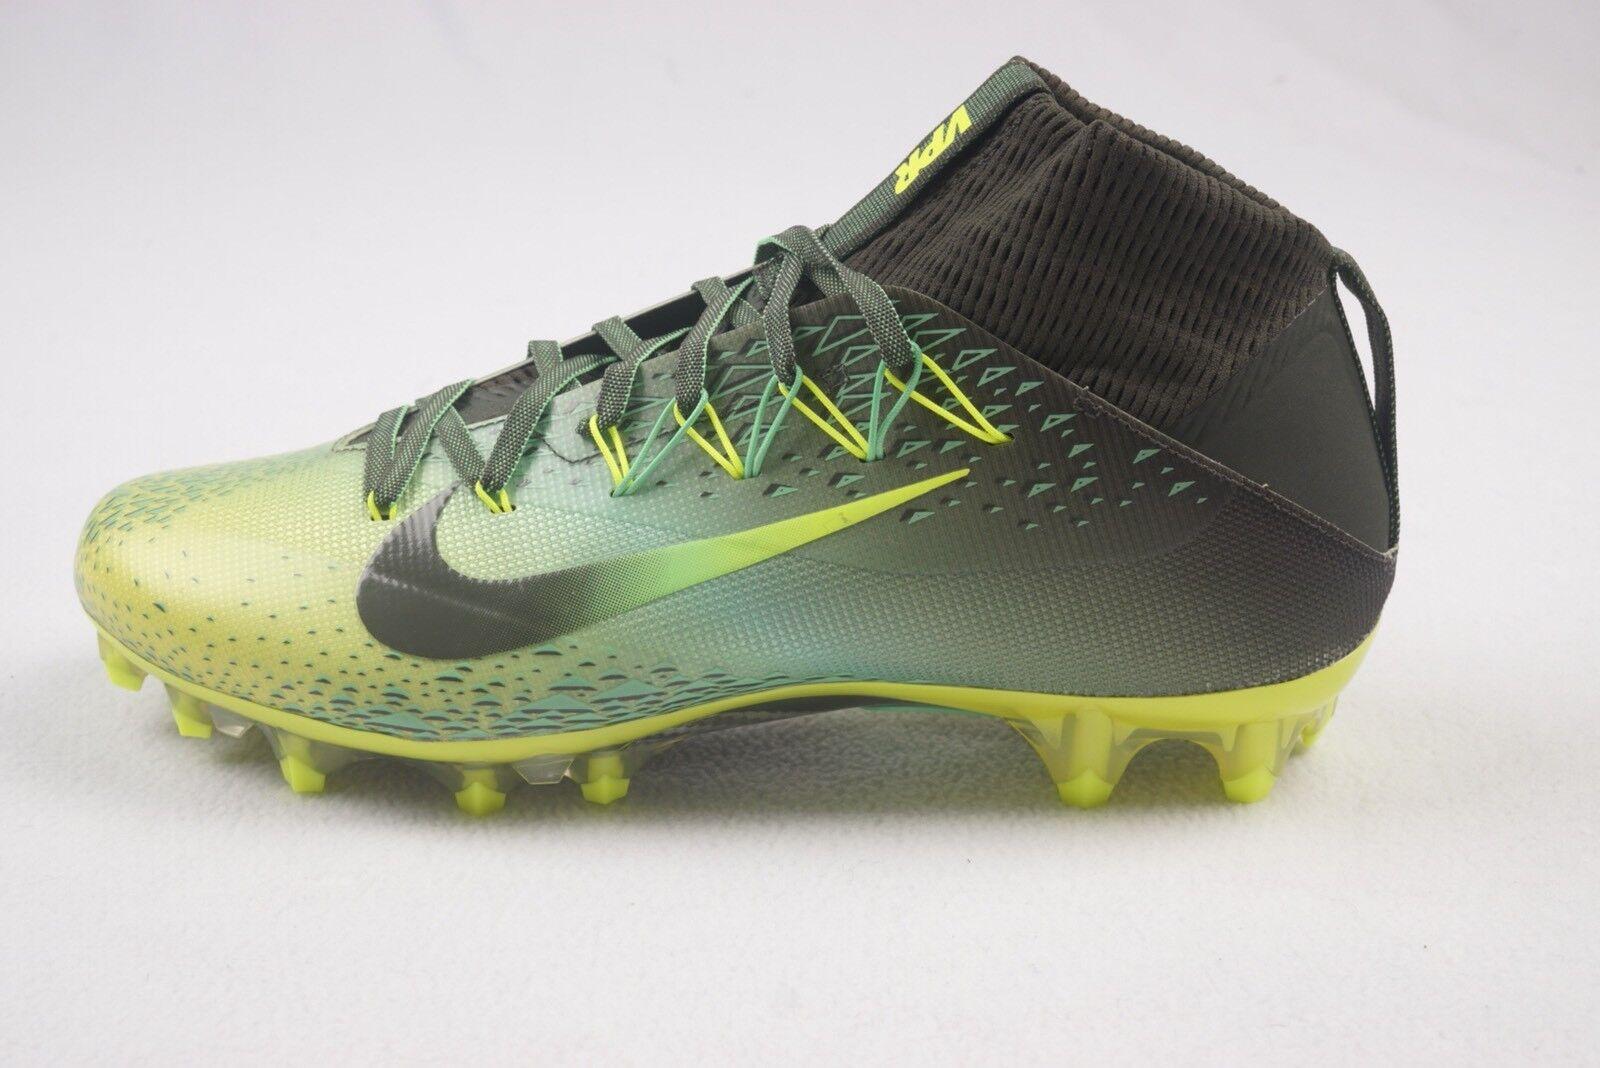 Nike Vapor Untouchable 2 Mens Football Cleats 10.5 Green Grey Volt Oregon Ducks